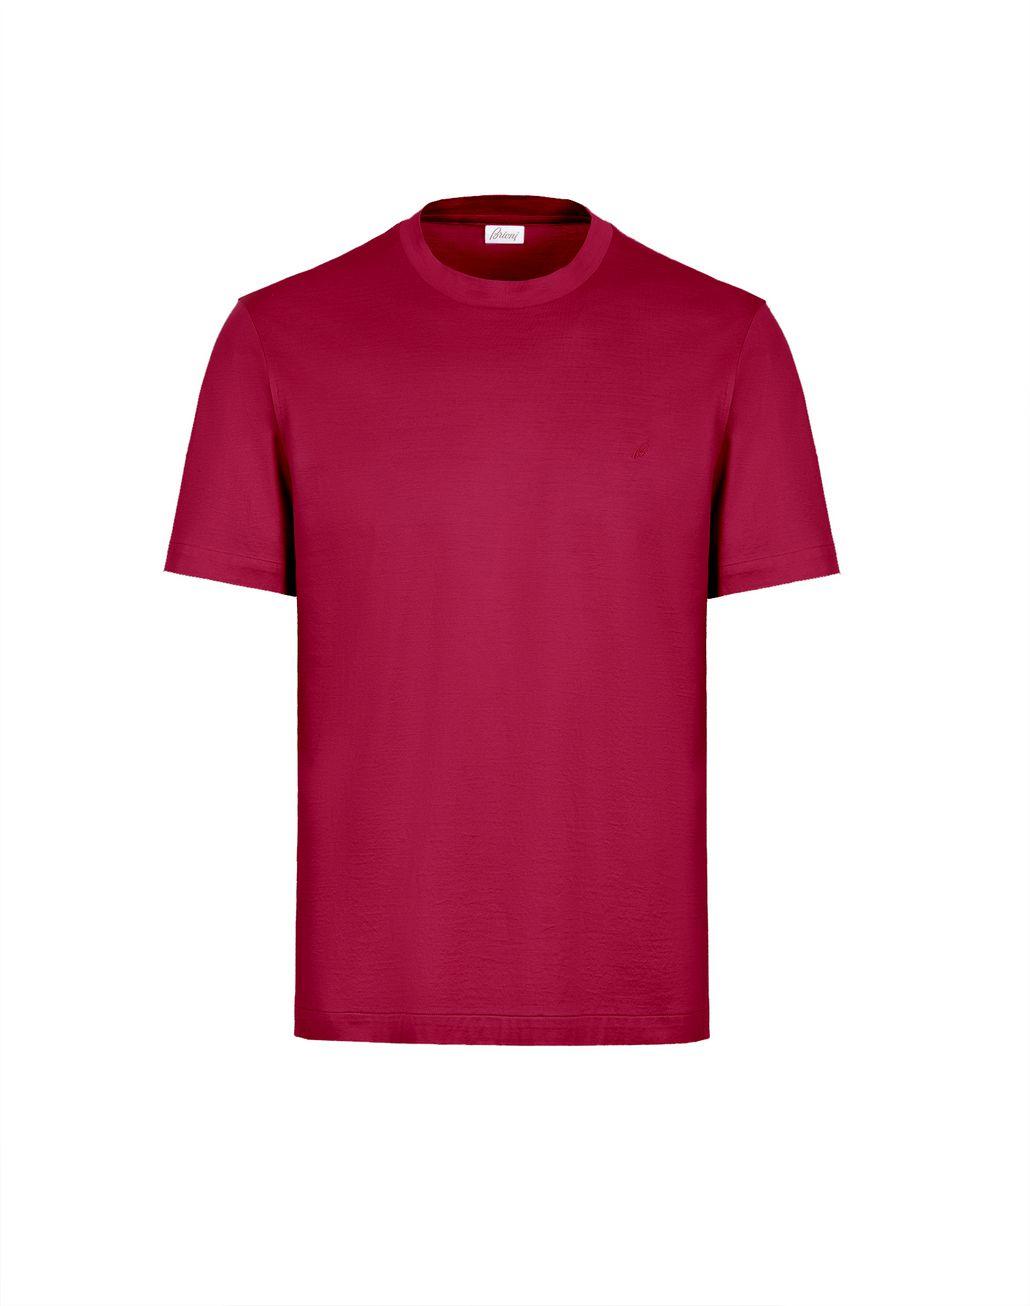 BRIONI Bordeaux Logoed T-Shirt T-Shirts & Polos Man f